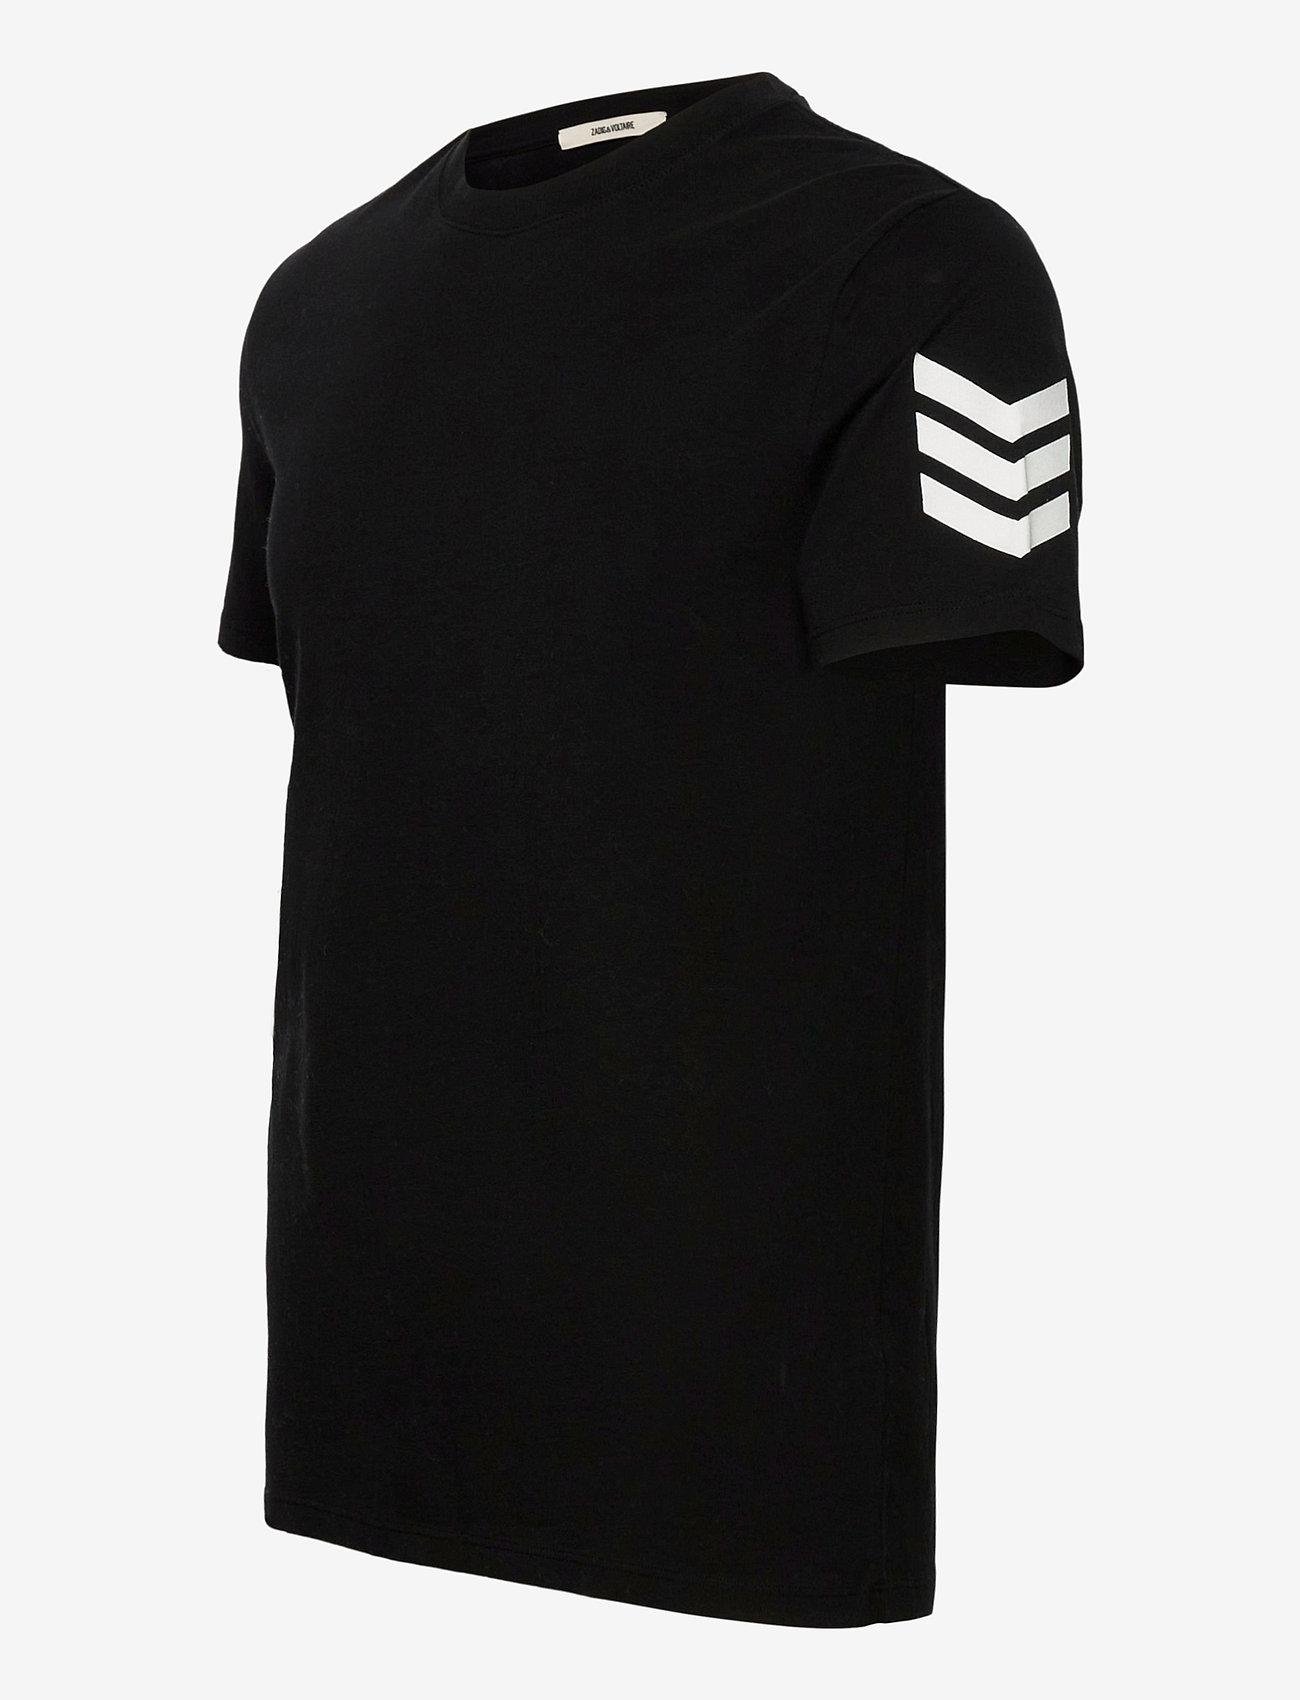 Zadig & Voltaire - TOMMY HC ARROW TEE-SHIRT PRINT ARROW SLEEVE - basic t-shirts - black - 2